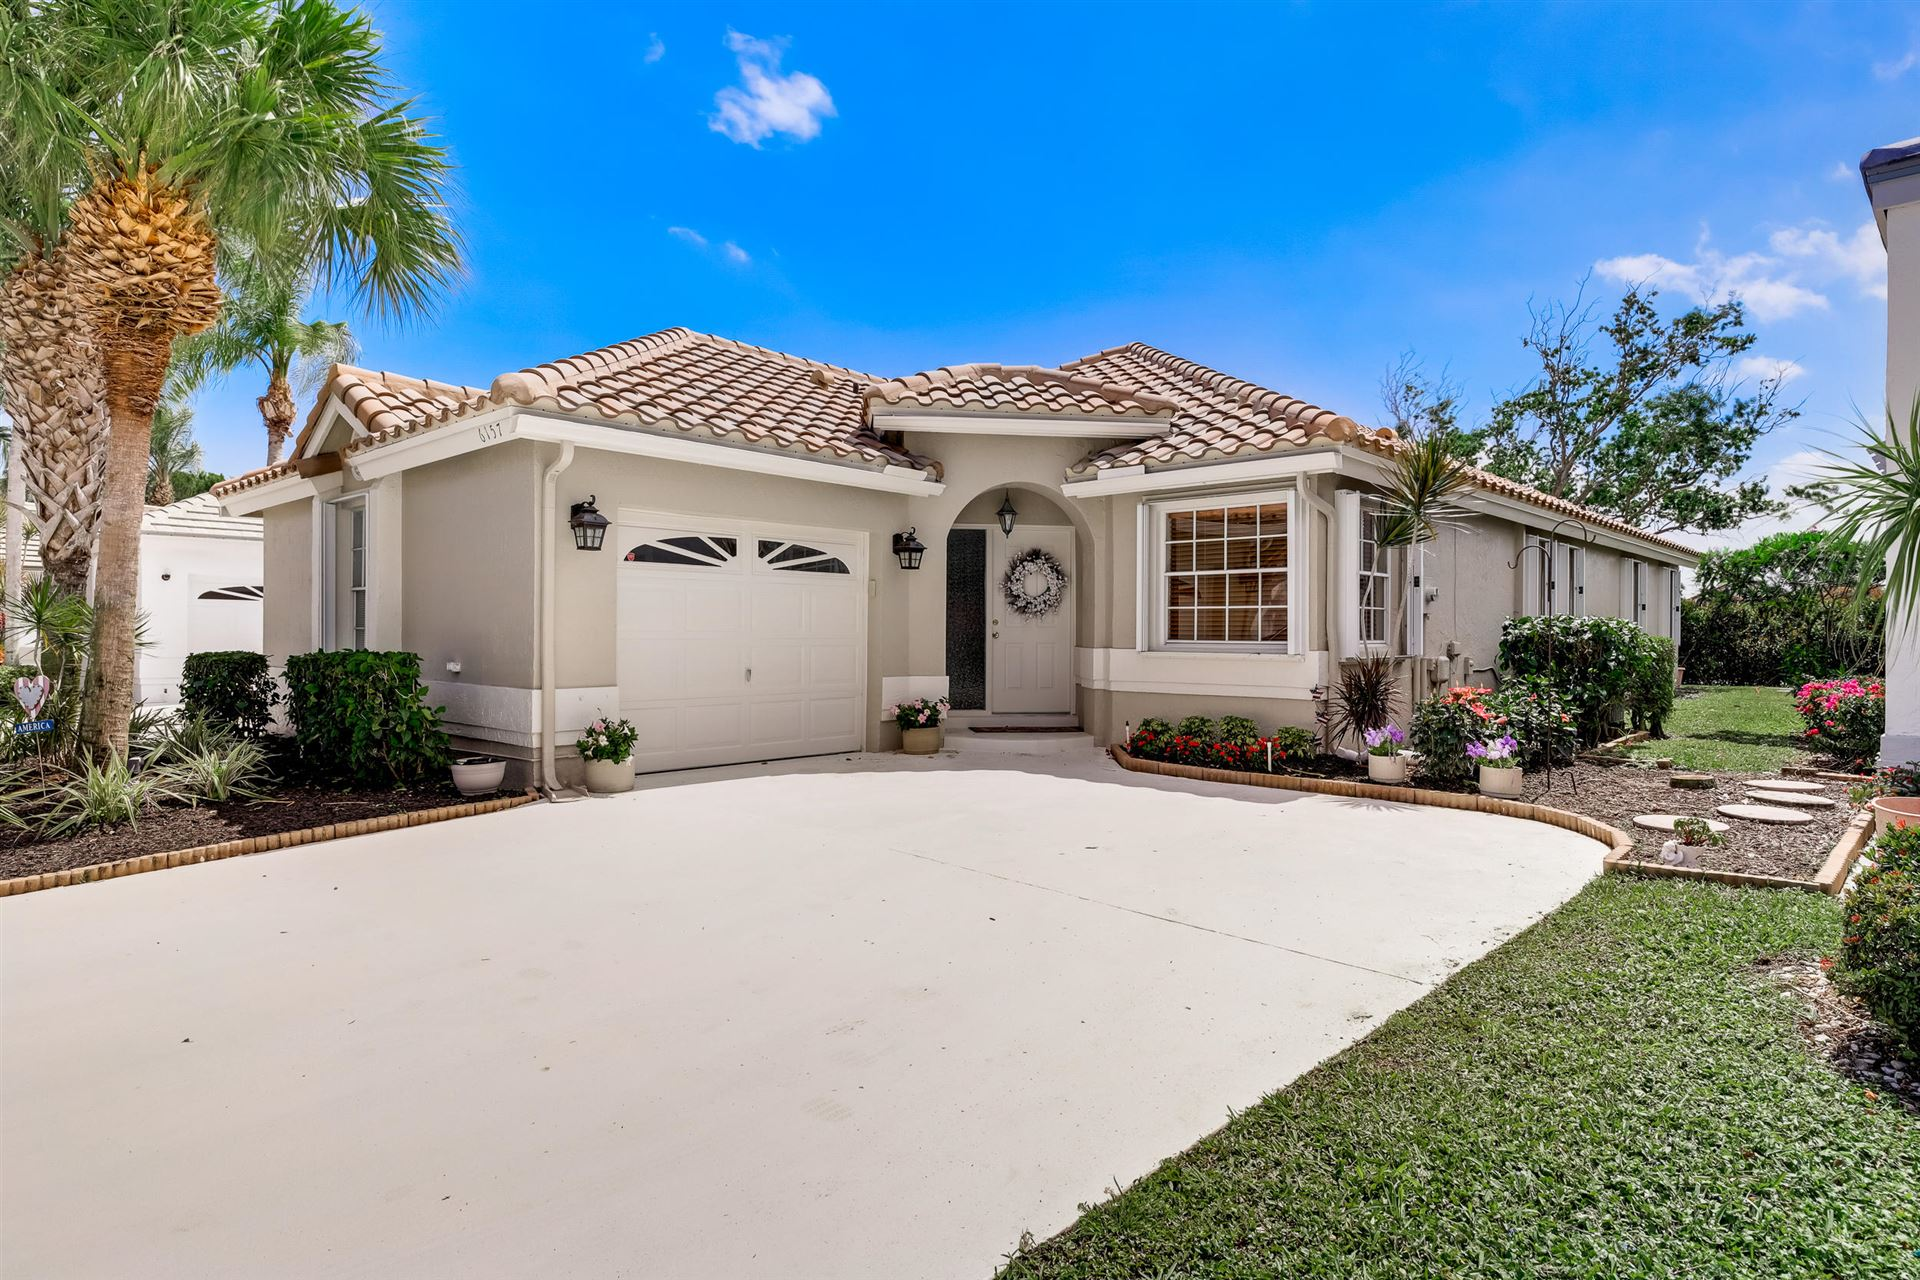 6157 Bay Isles Drive, Boynton Beach, FL 33437 - MLS#: RX-10732916